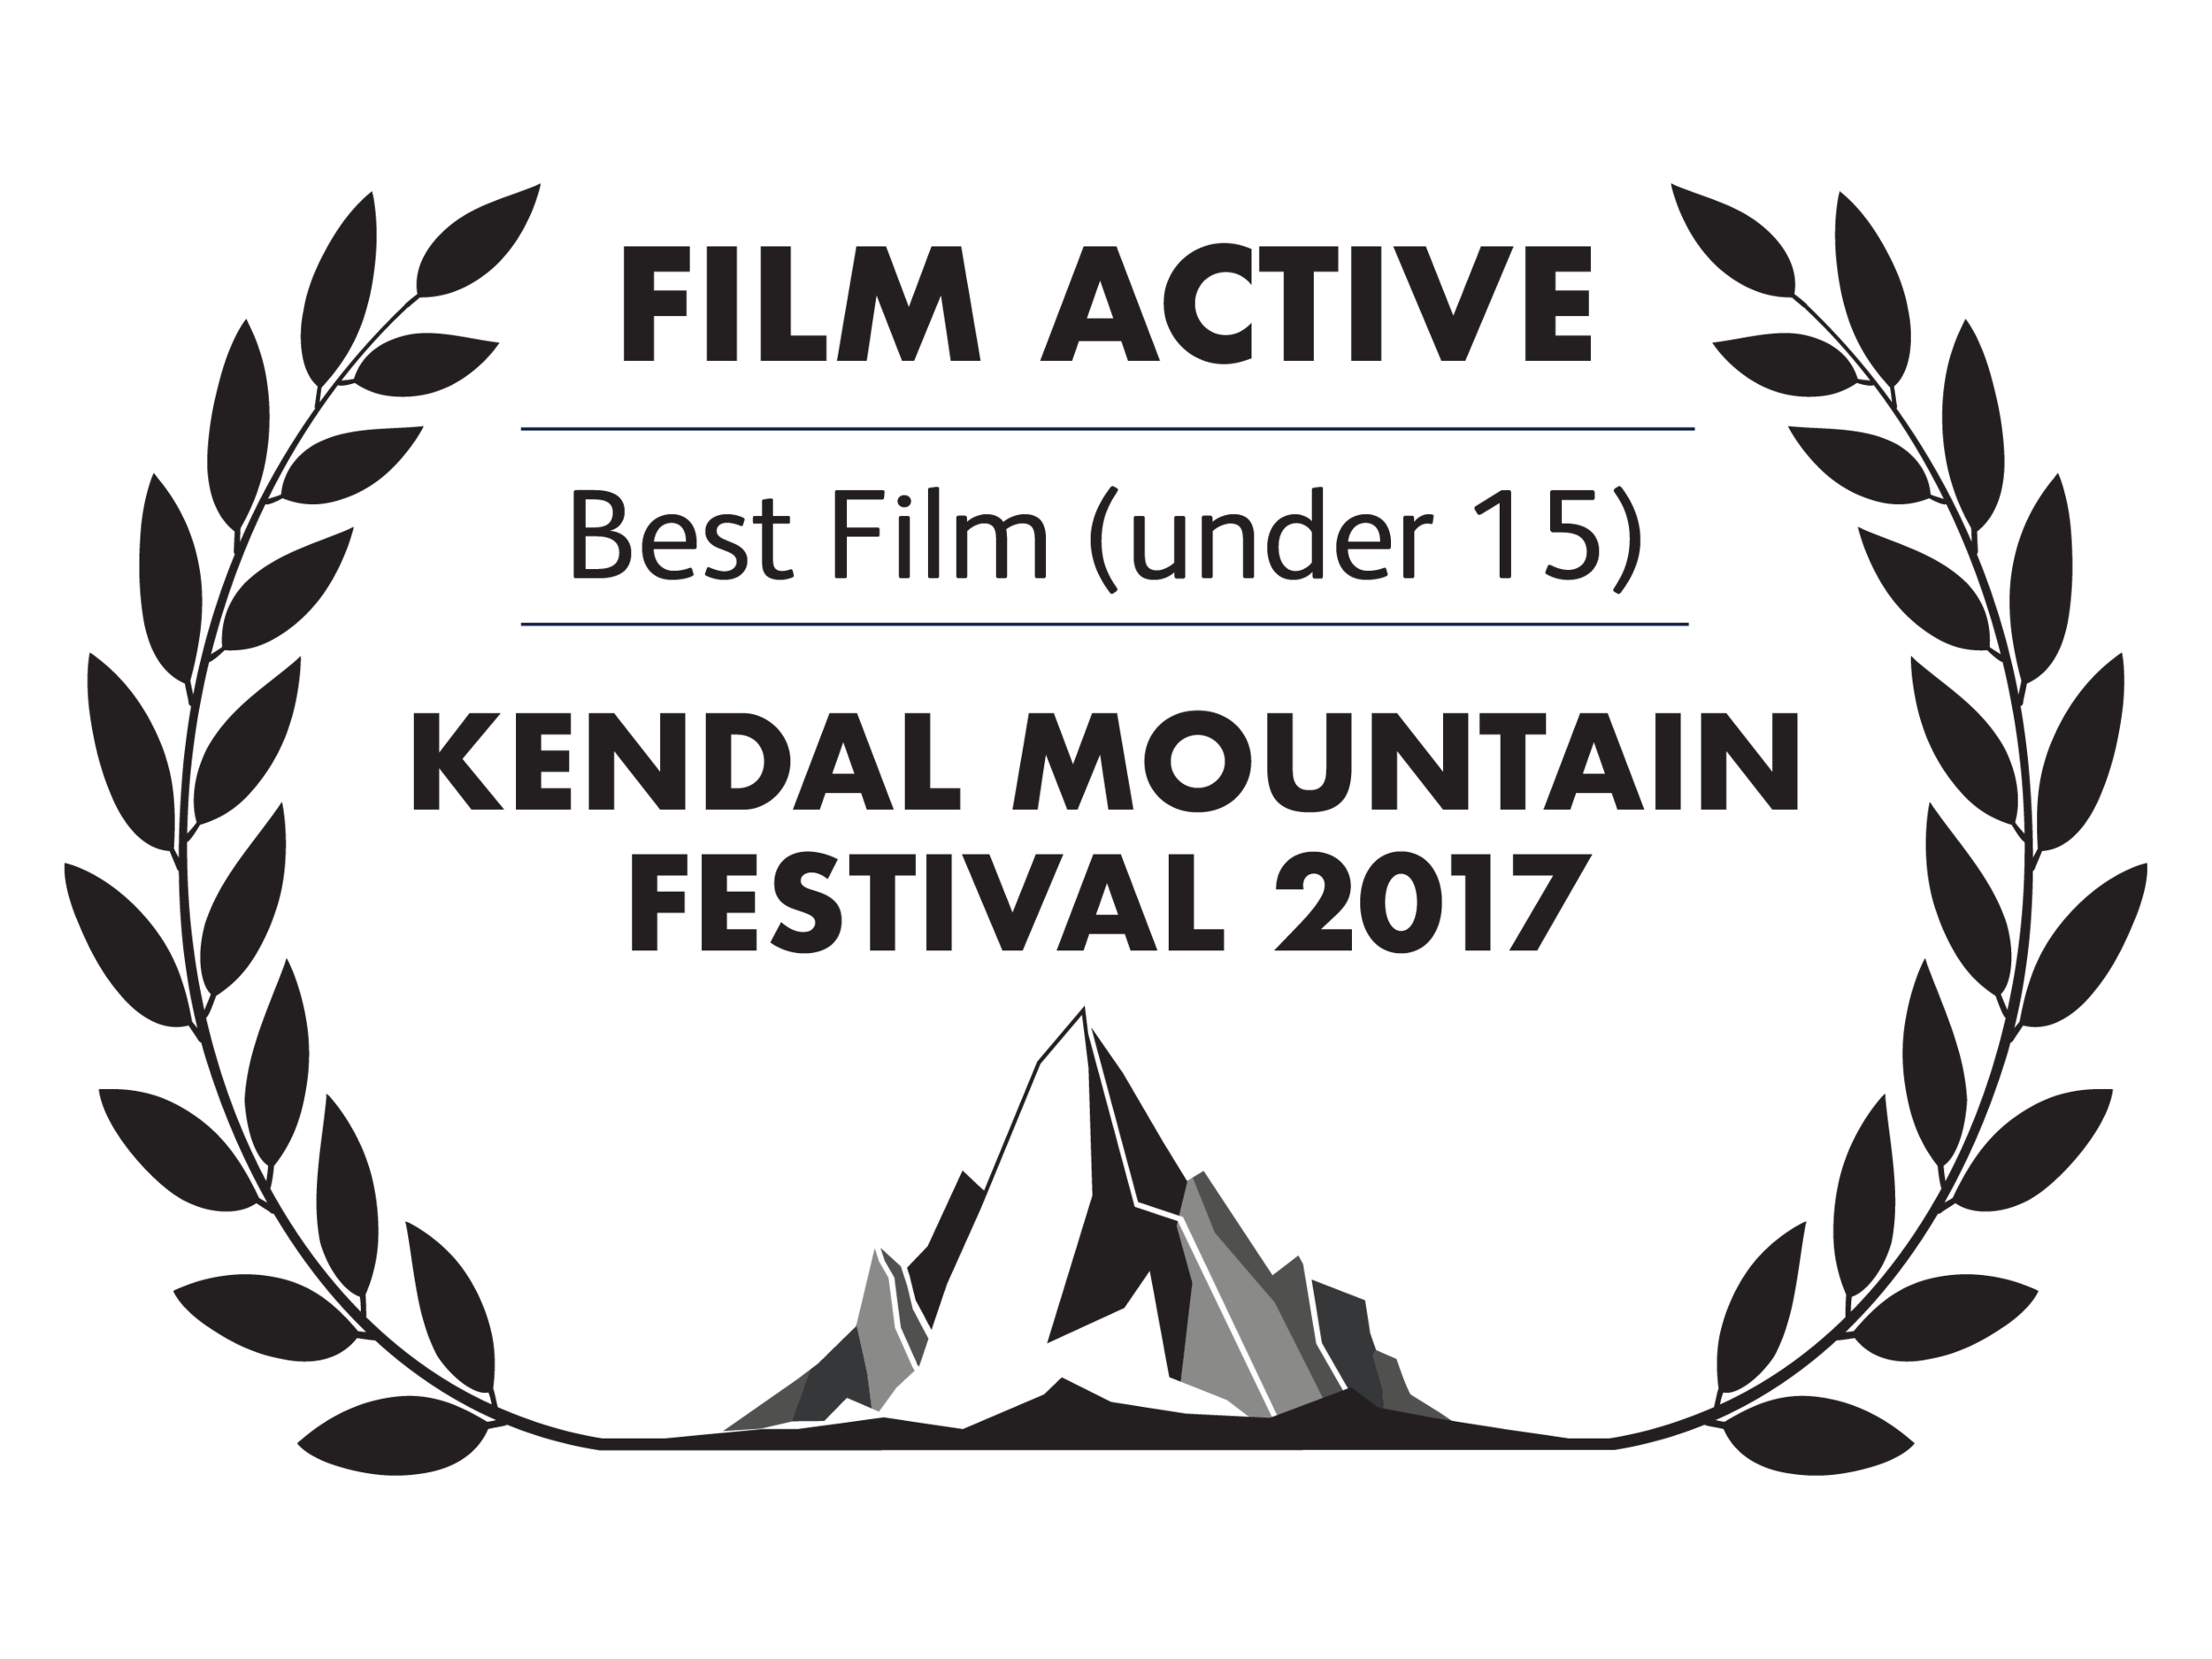 KMF LAURELS MASTER NEW 2017 FILM ACTIVE-02.png